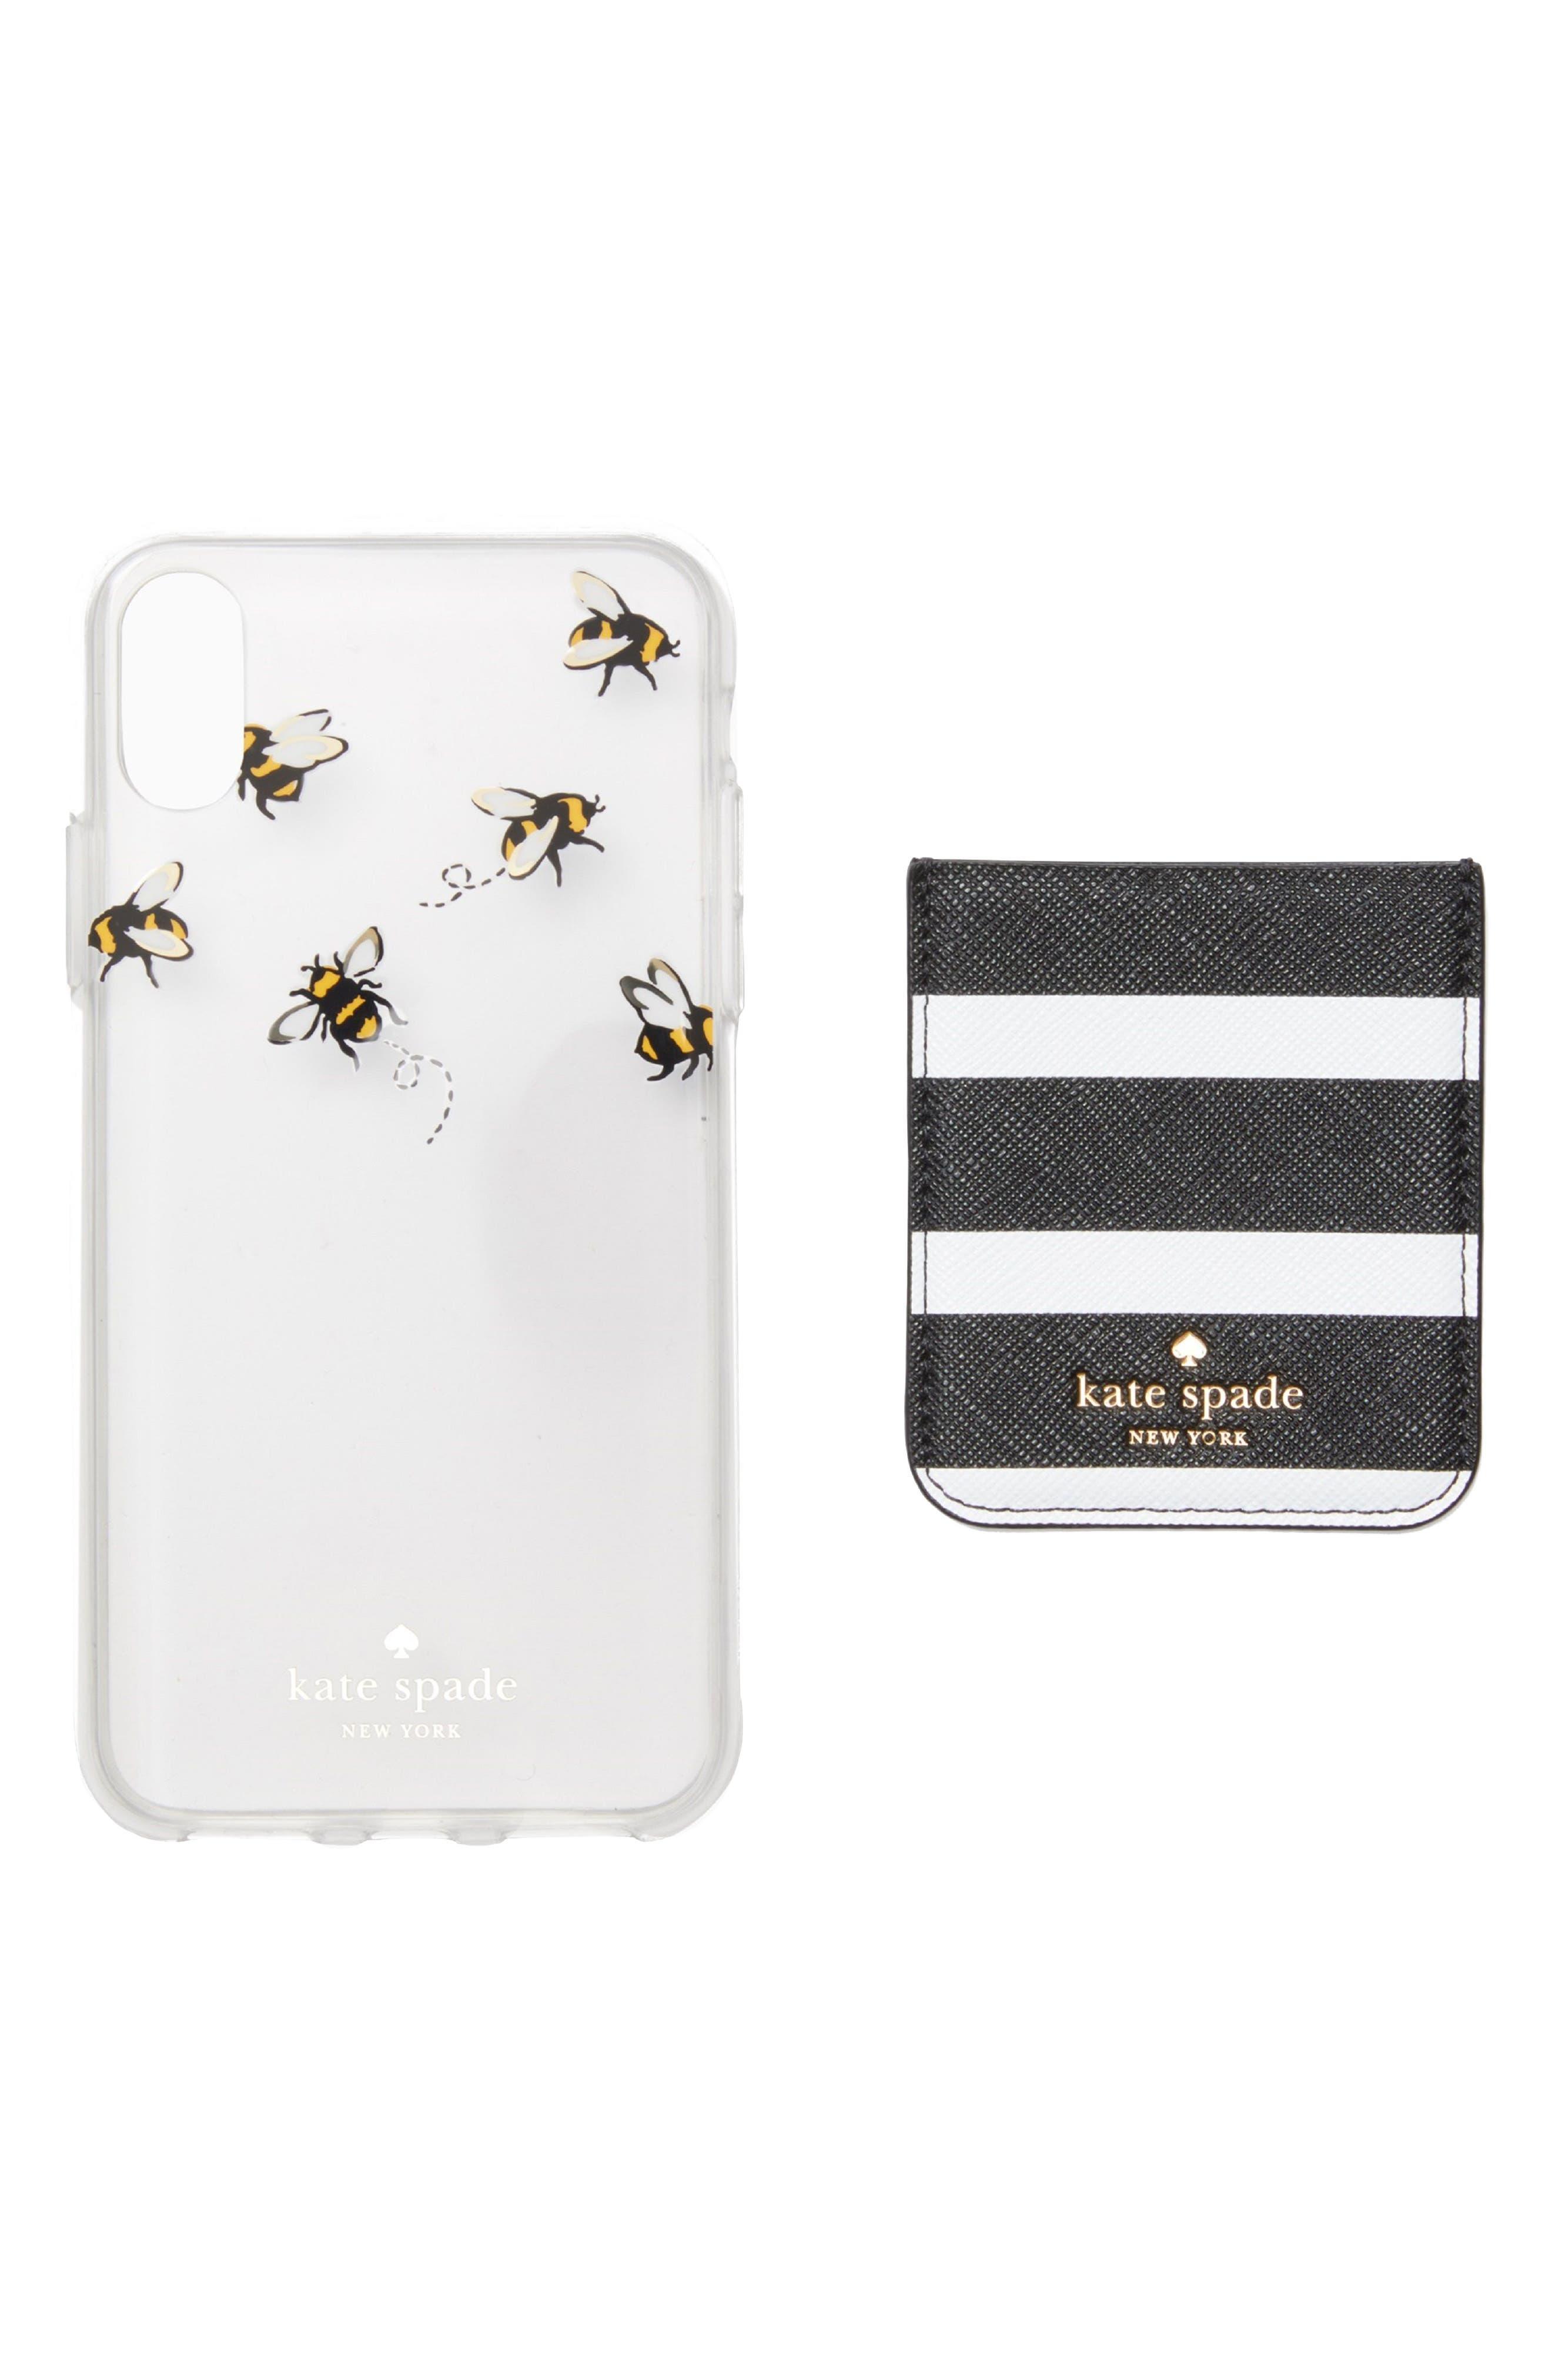 stick to it iPhone X case & sticker pocket set,                             Main thumbnail 1, color,                             Multi